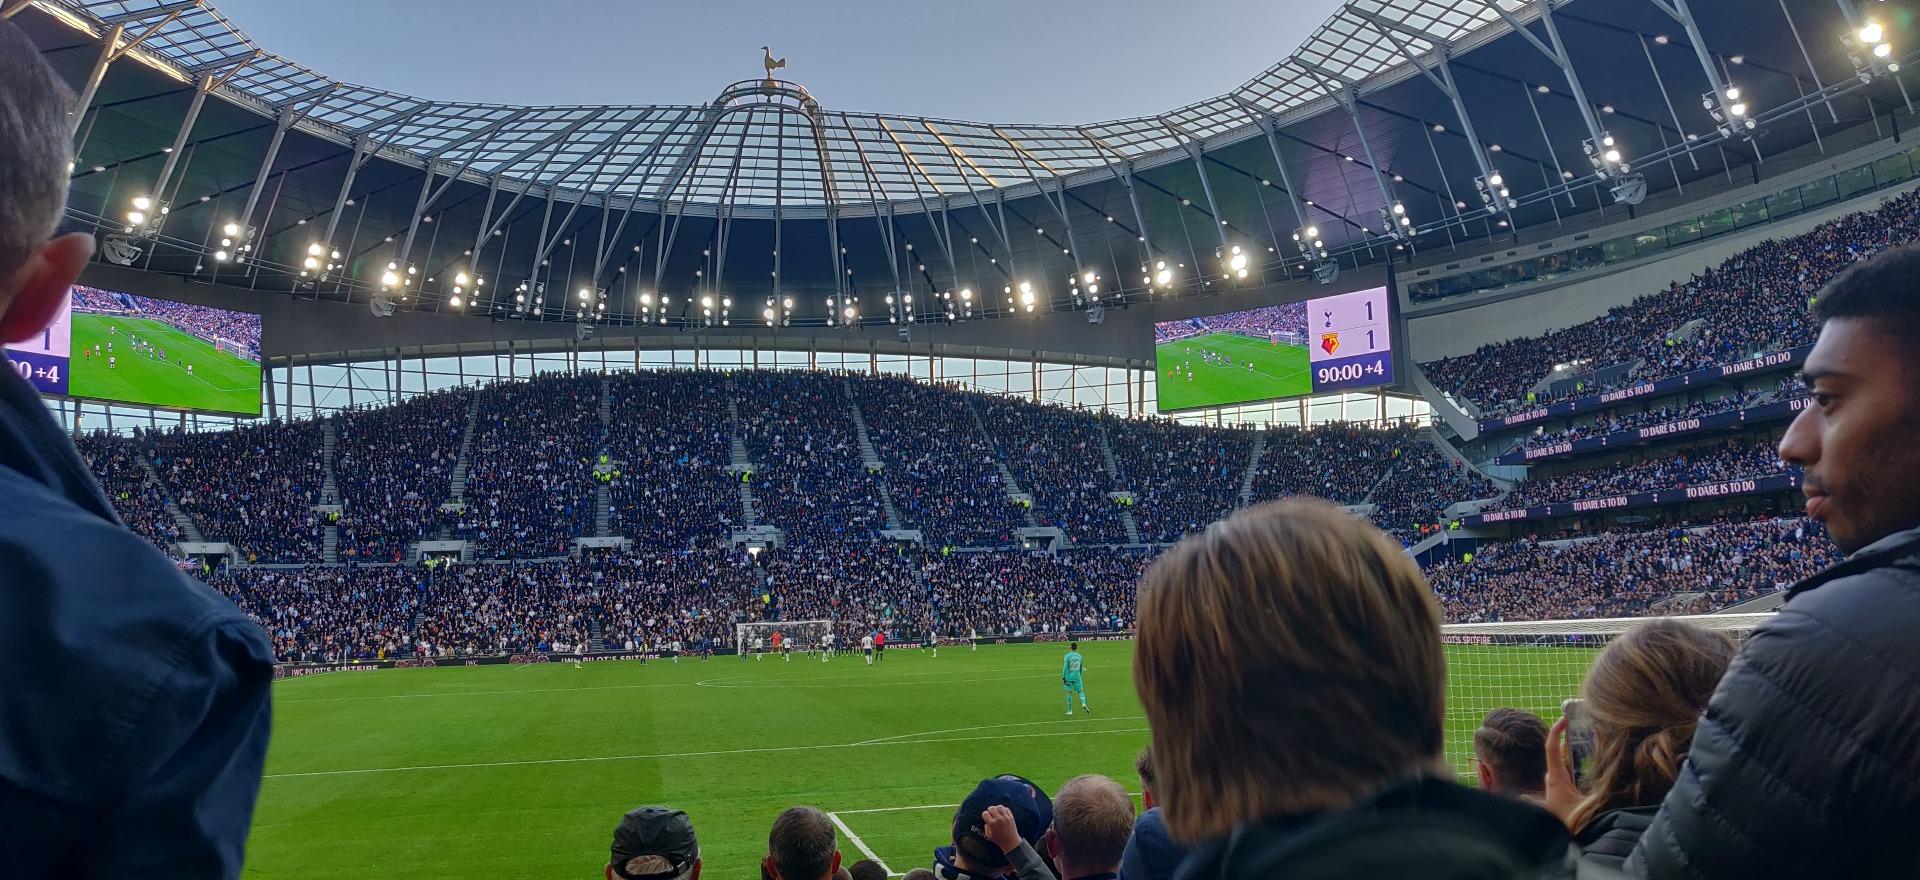 Tottenham Hotspur Stadium Section 113 Row 11 Seat 393